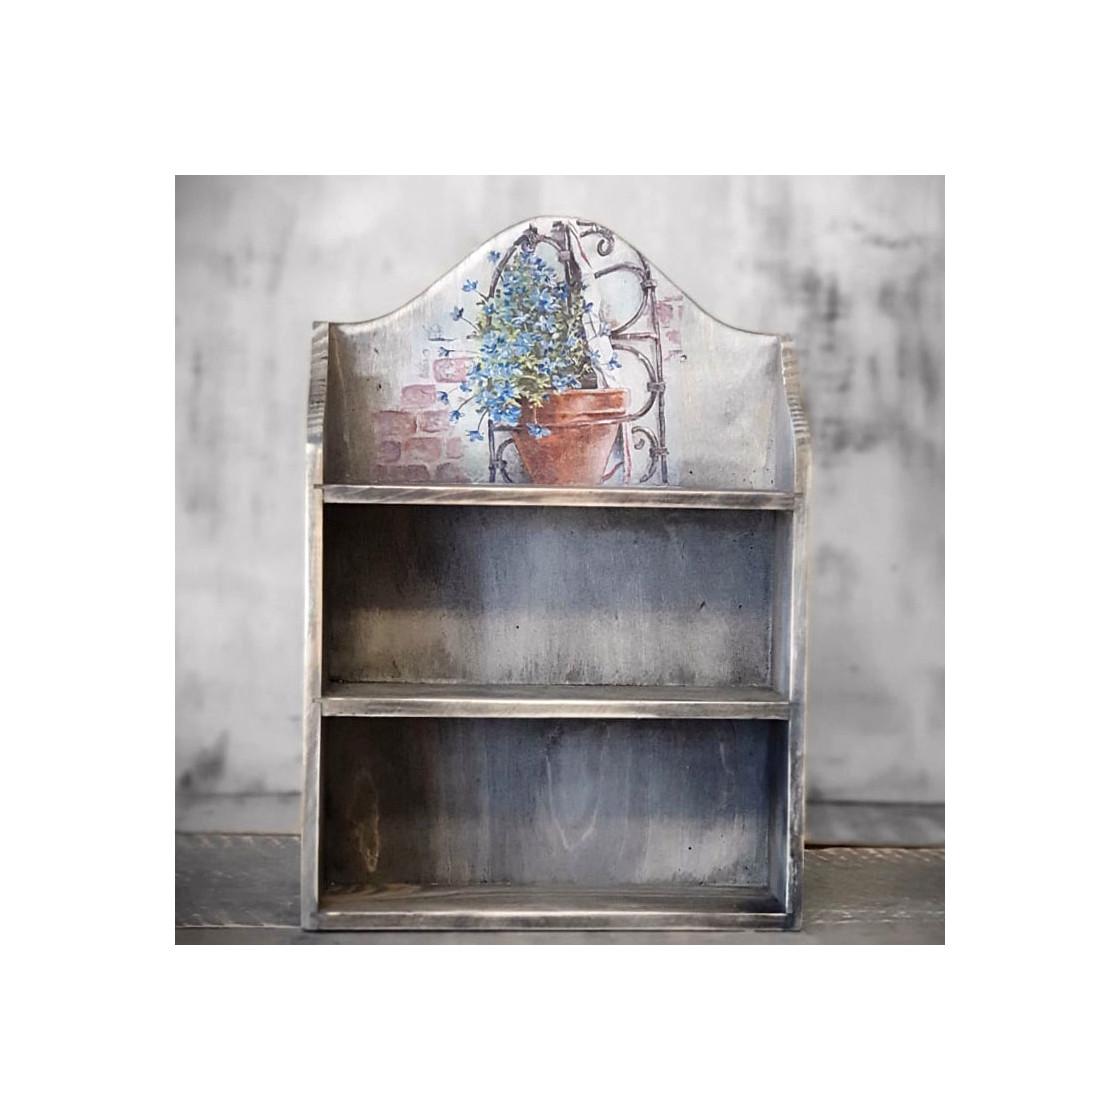 handmade4u | vintage wandregal miniregal holz gewürzregal ablage